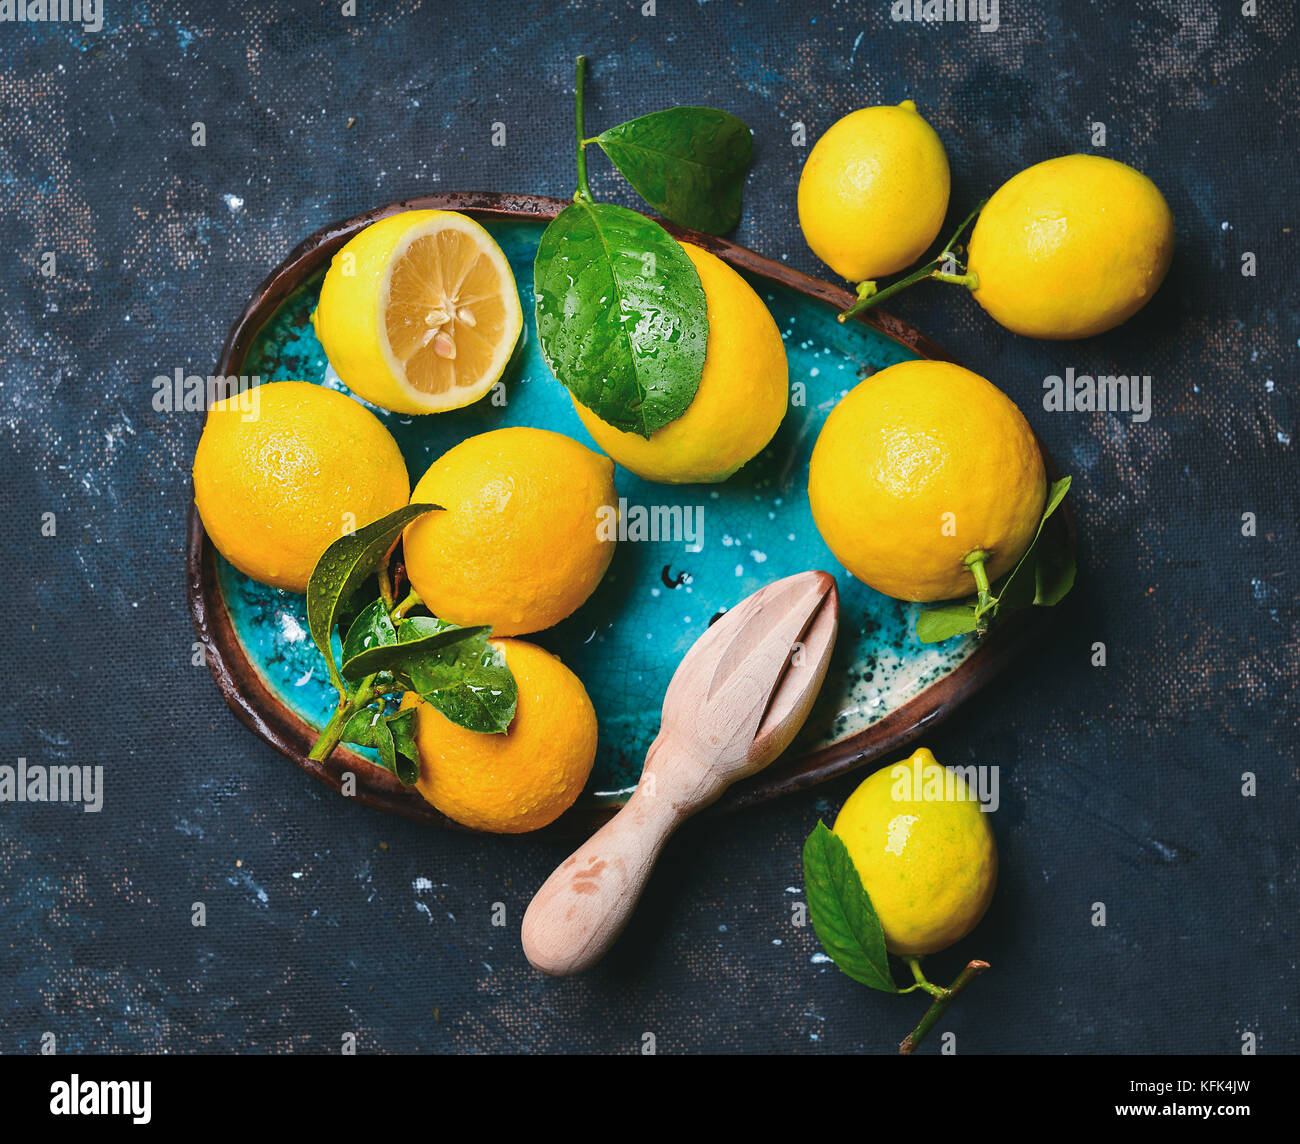 Freshly picked lemons with leaves in blue ceramic plate - Stock Image